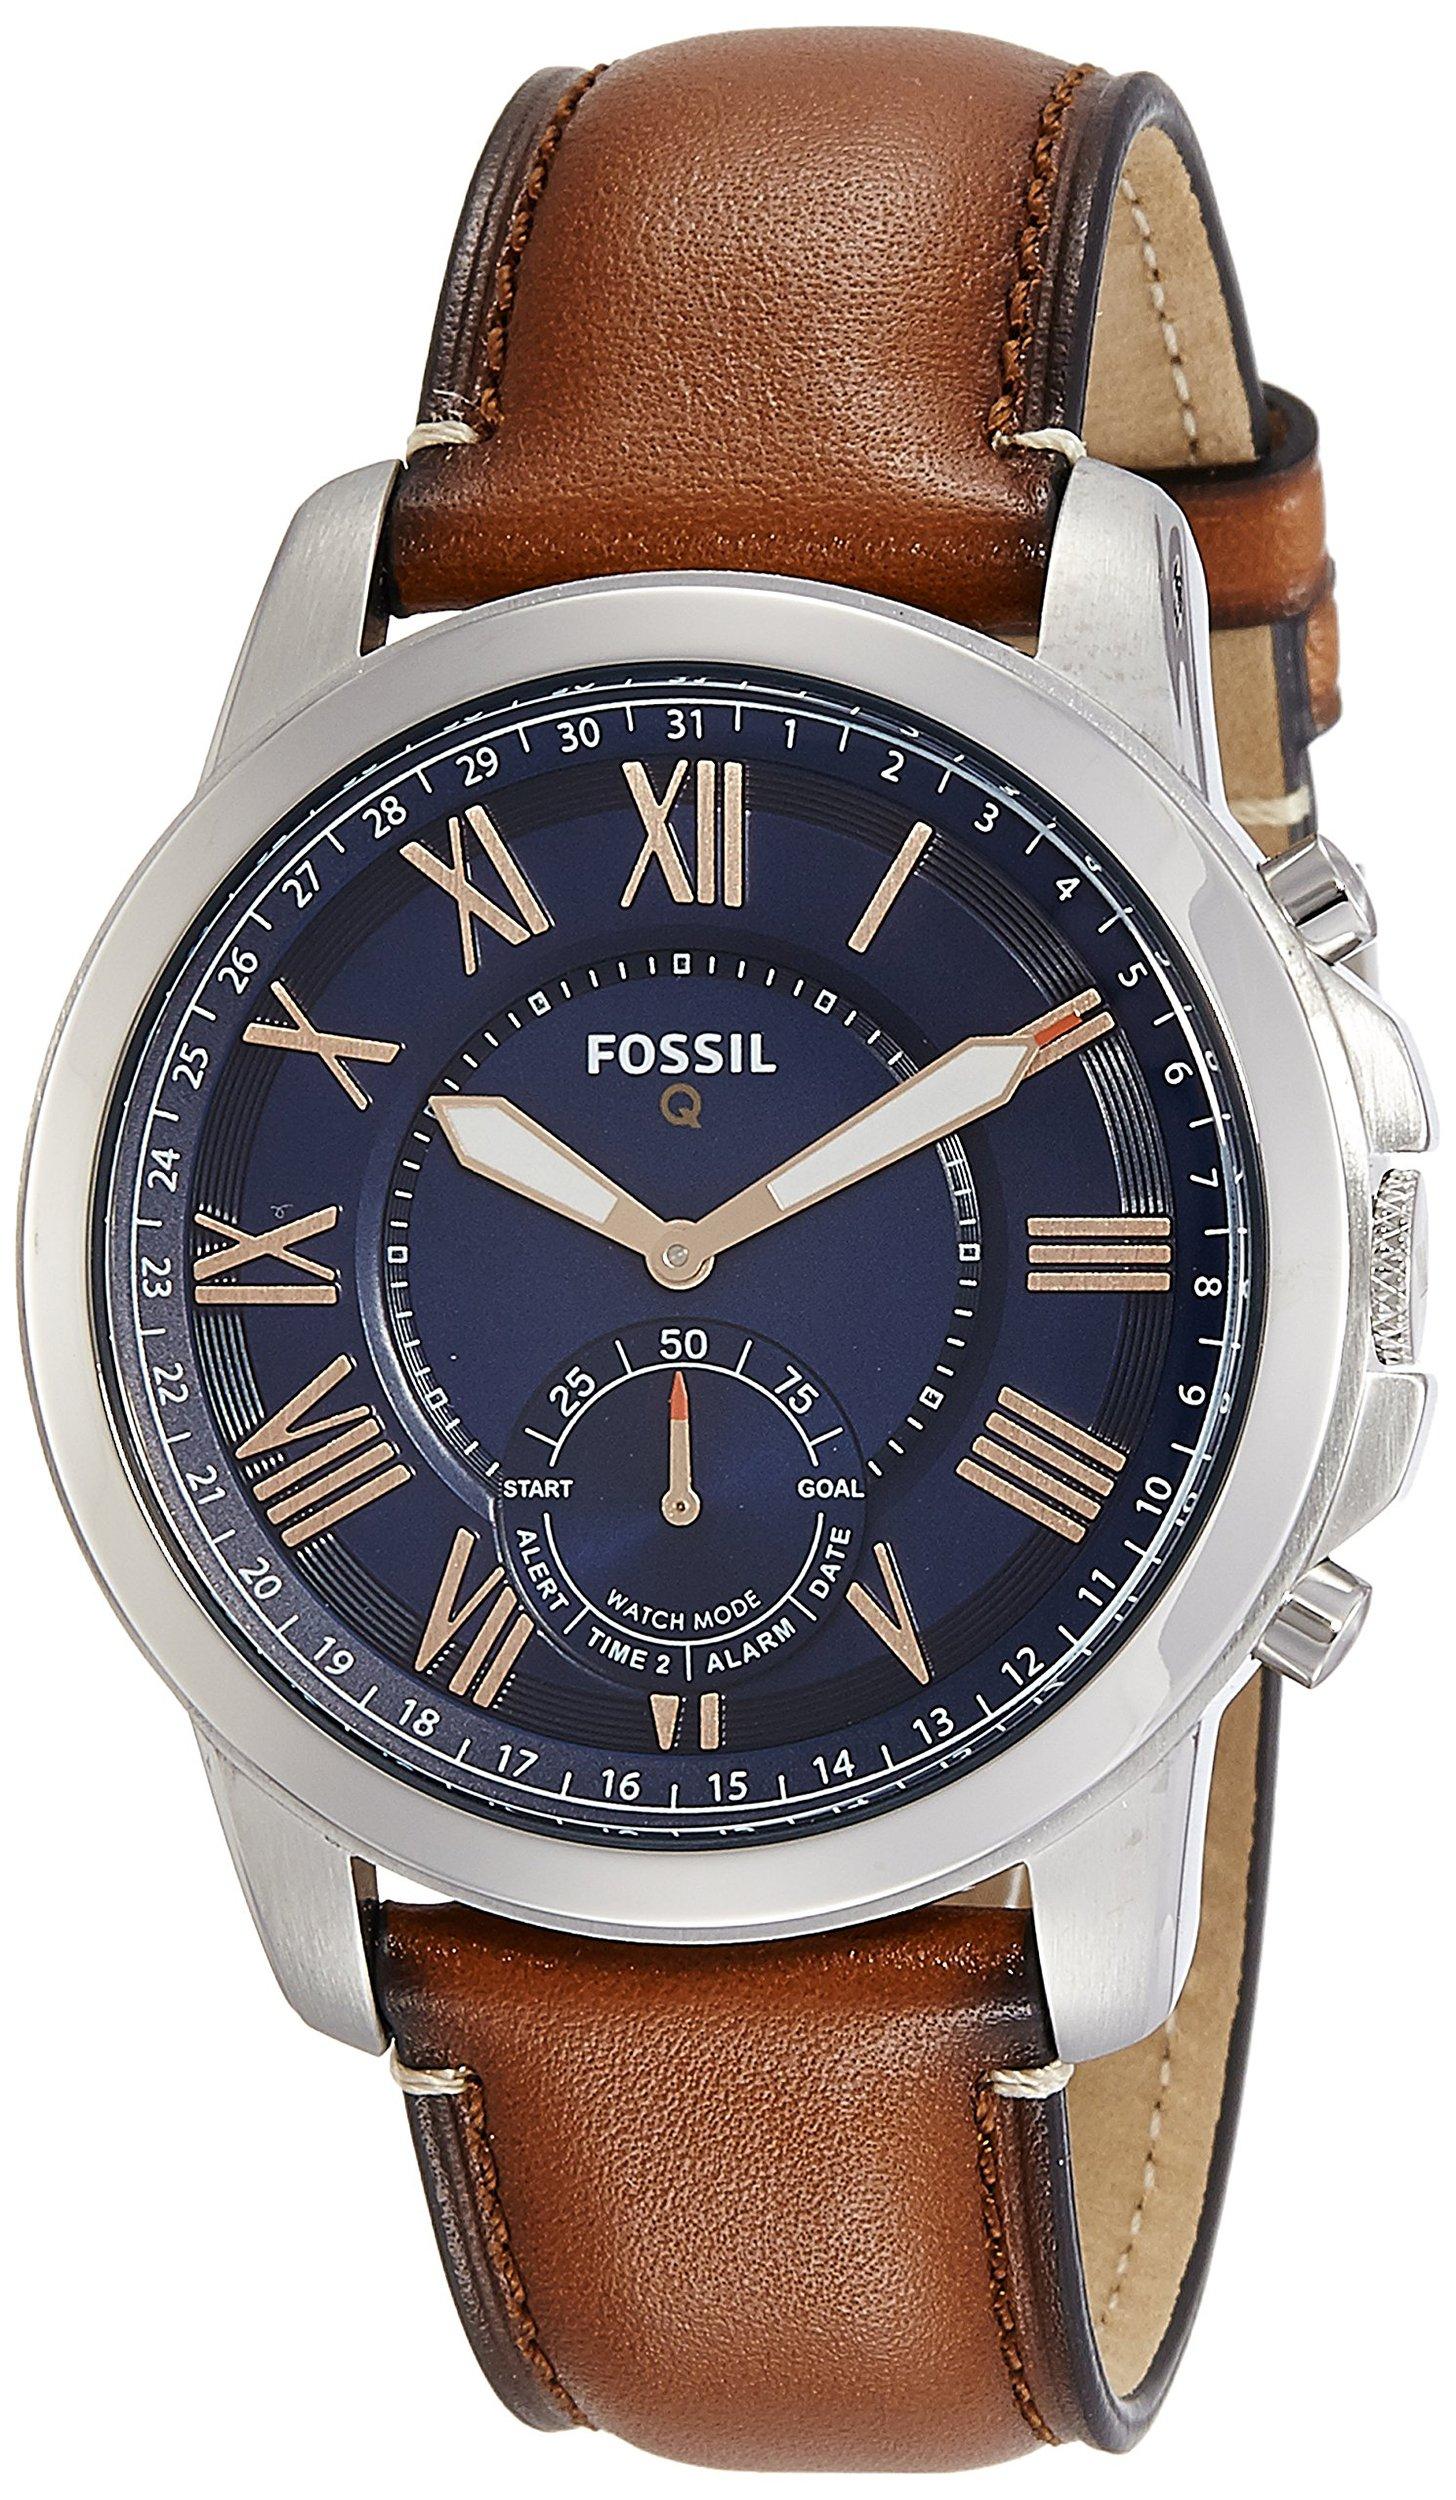 Fossil FTW1122 Q Grant Gen 2 Hybrid Smartwatch, Light Brown Leather